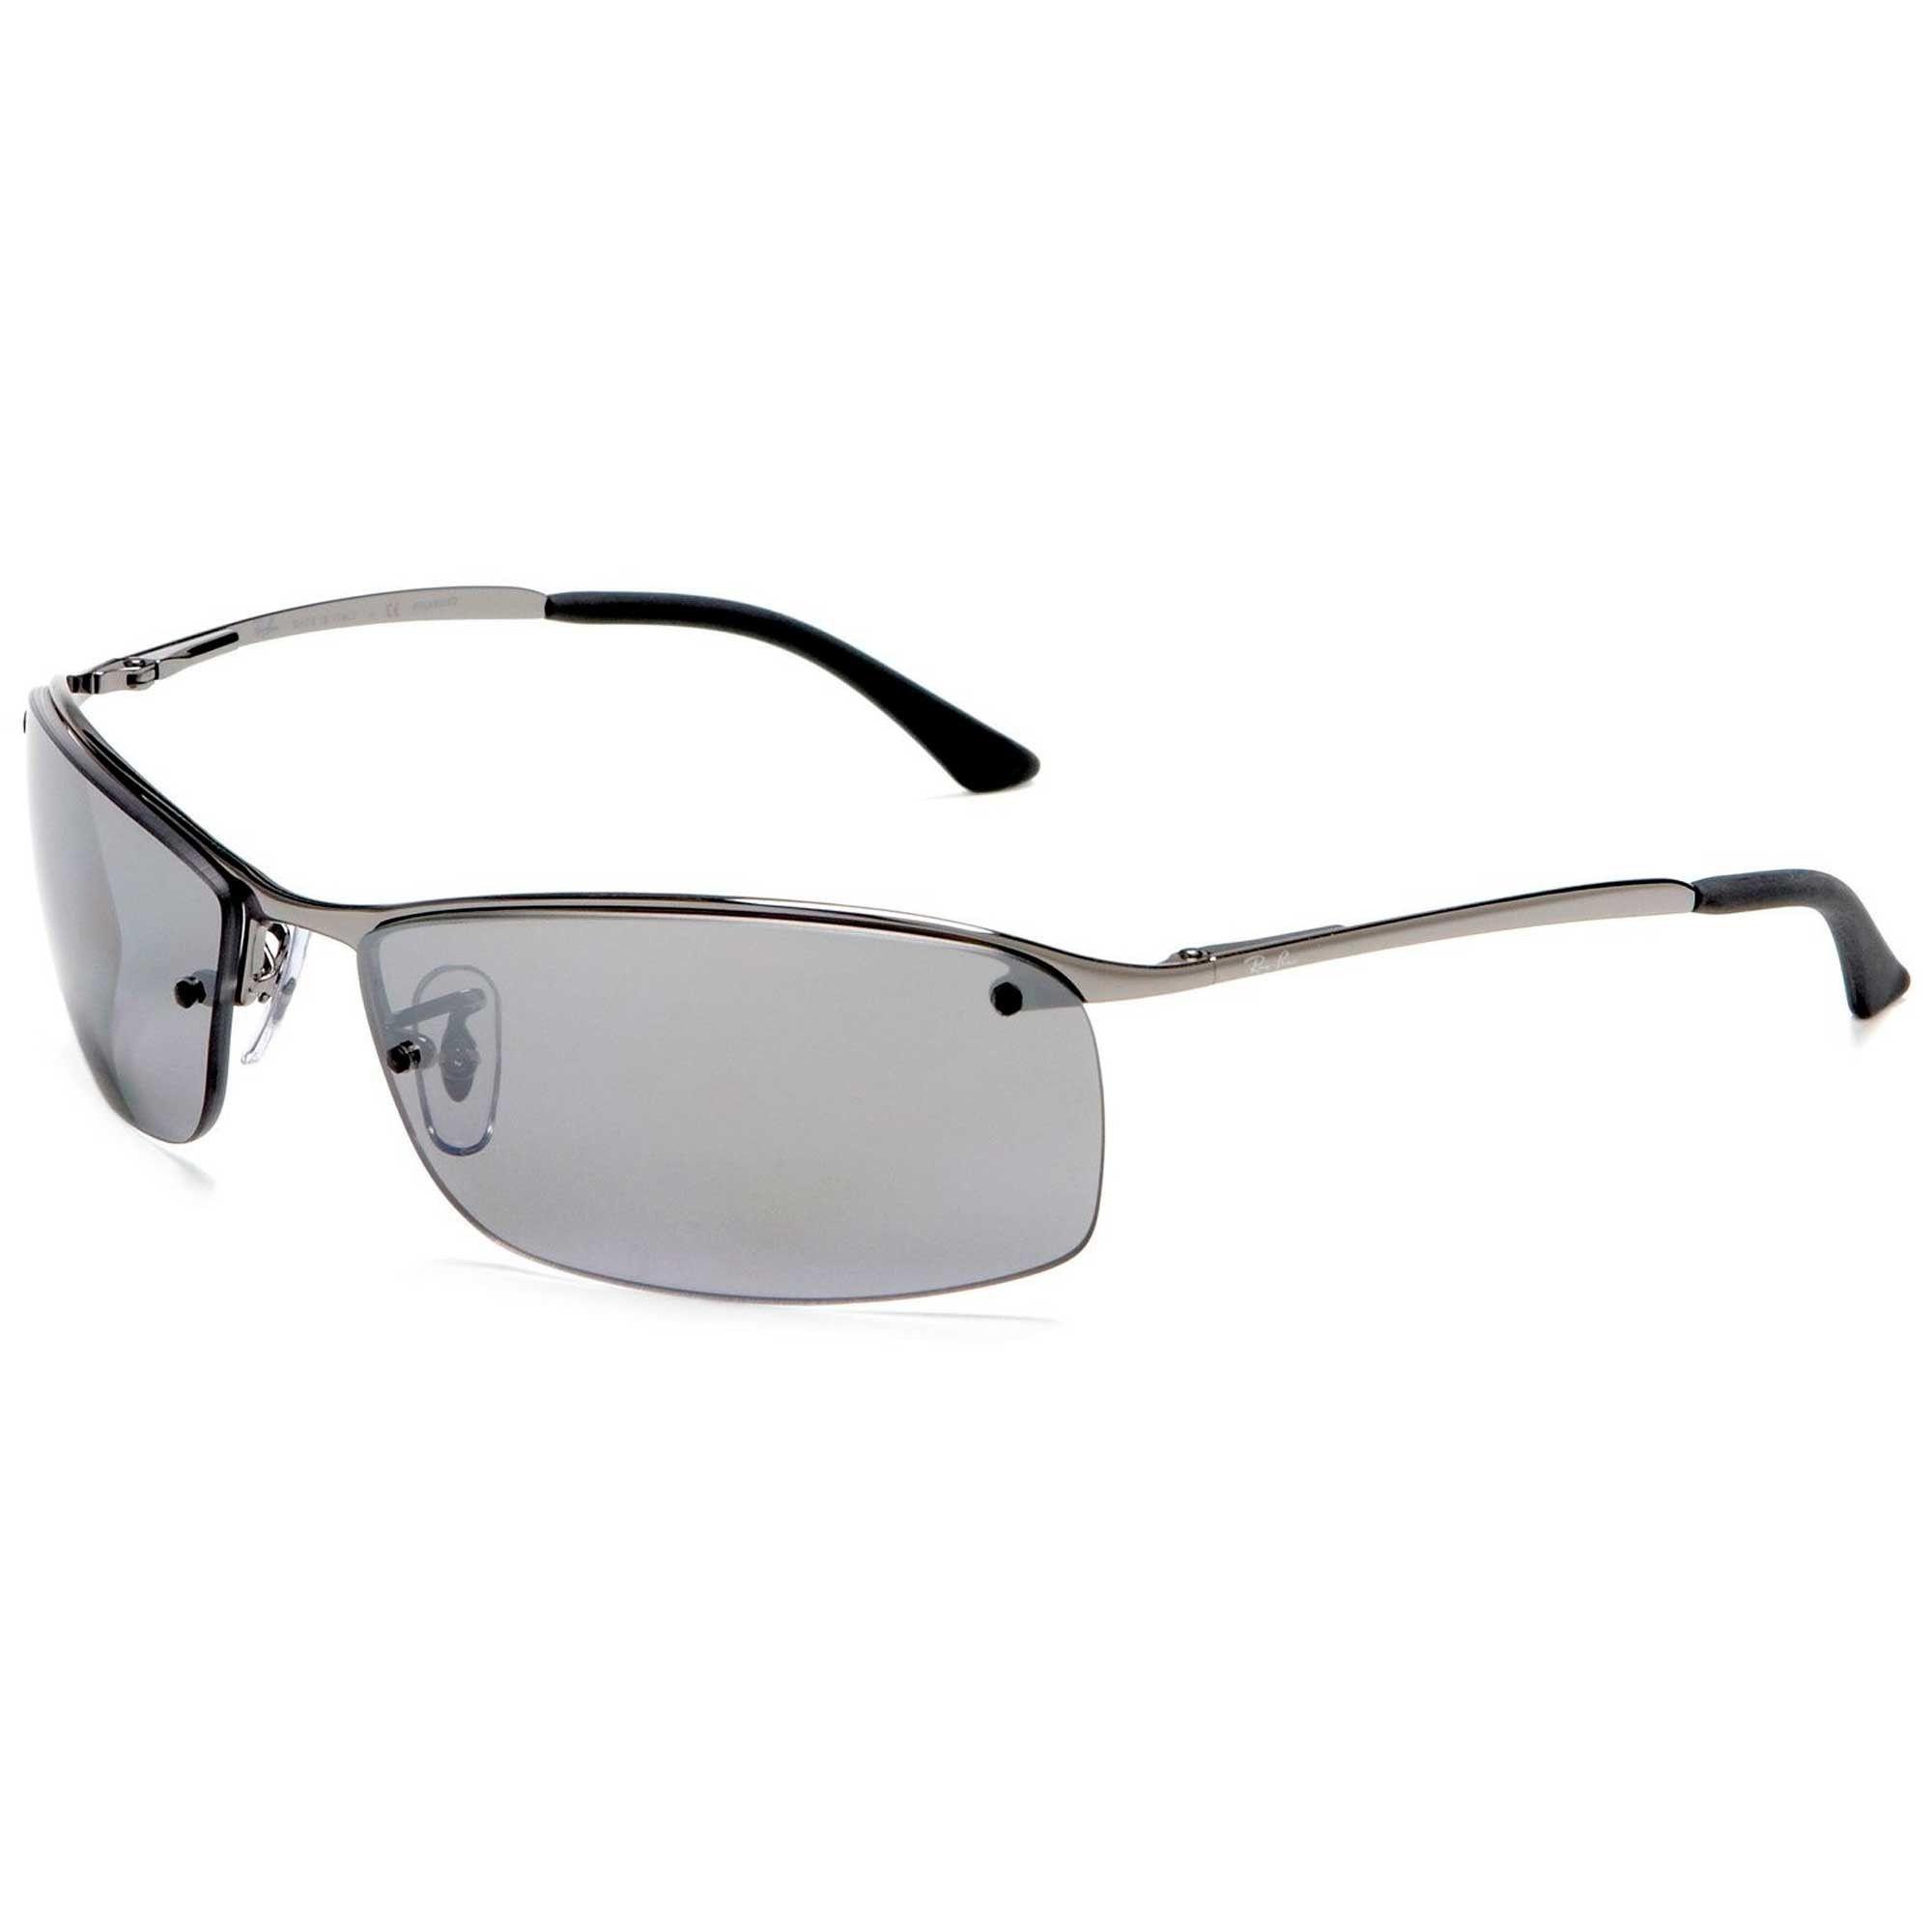 594ac33c9b Ray-Ban Gunmetal Silver Mirror RB3183 Polarized Sunglasses ...